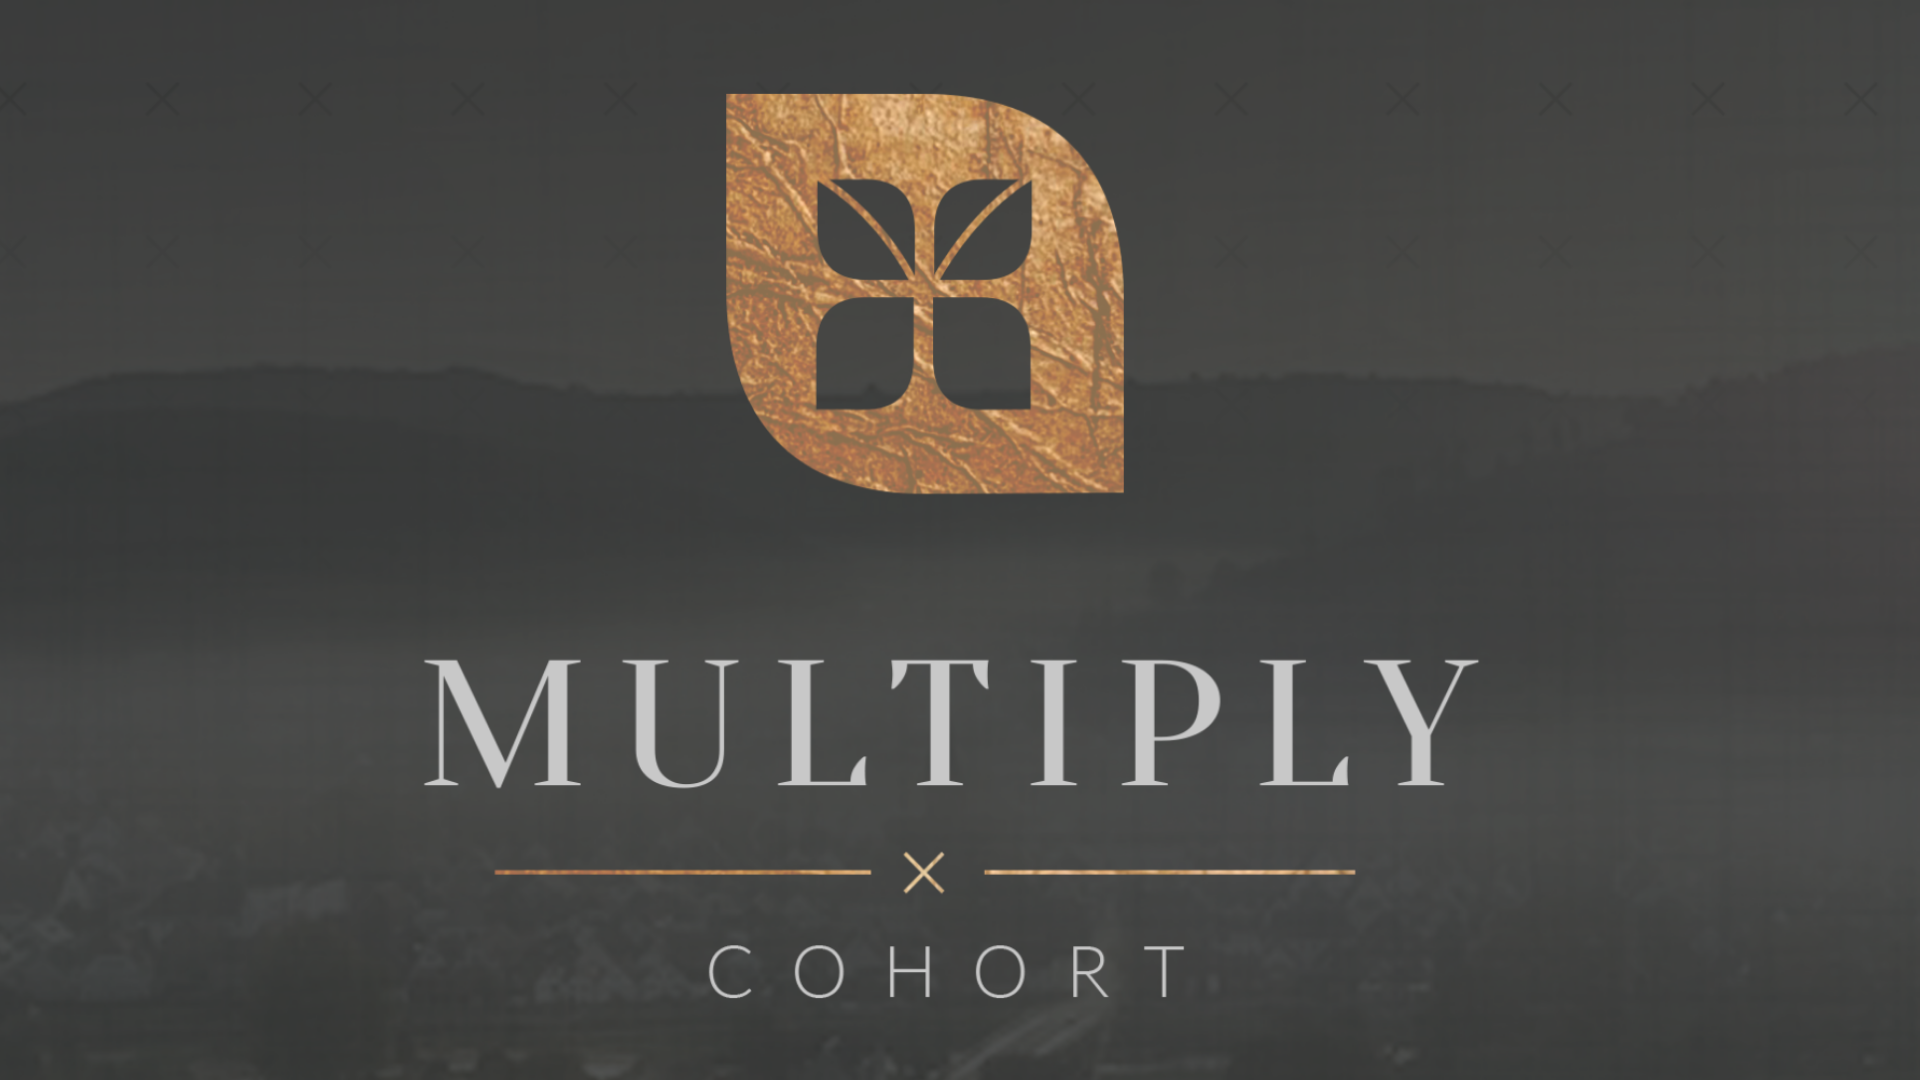 Multiply Cohort